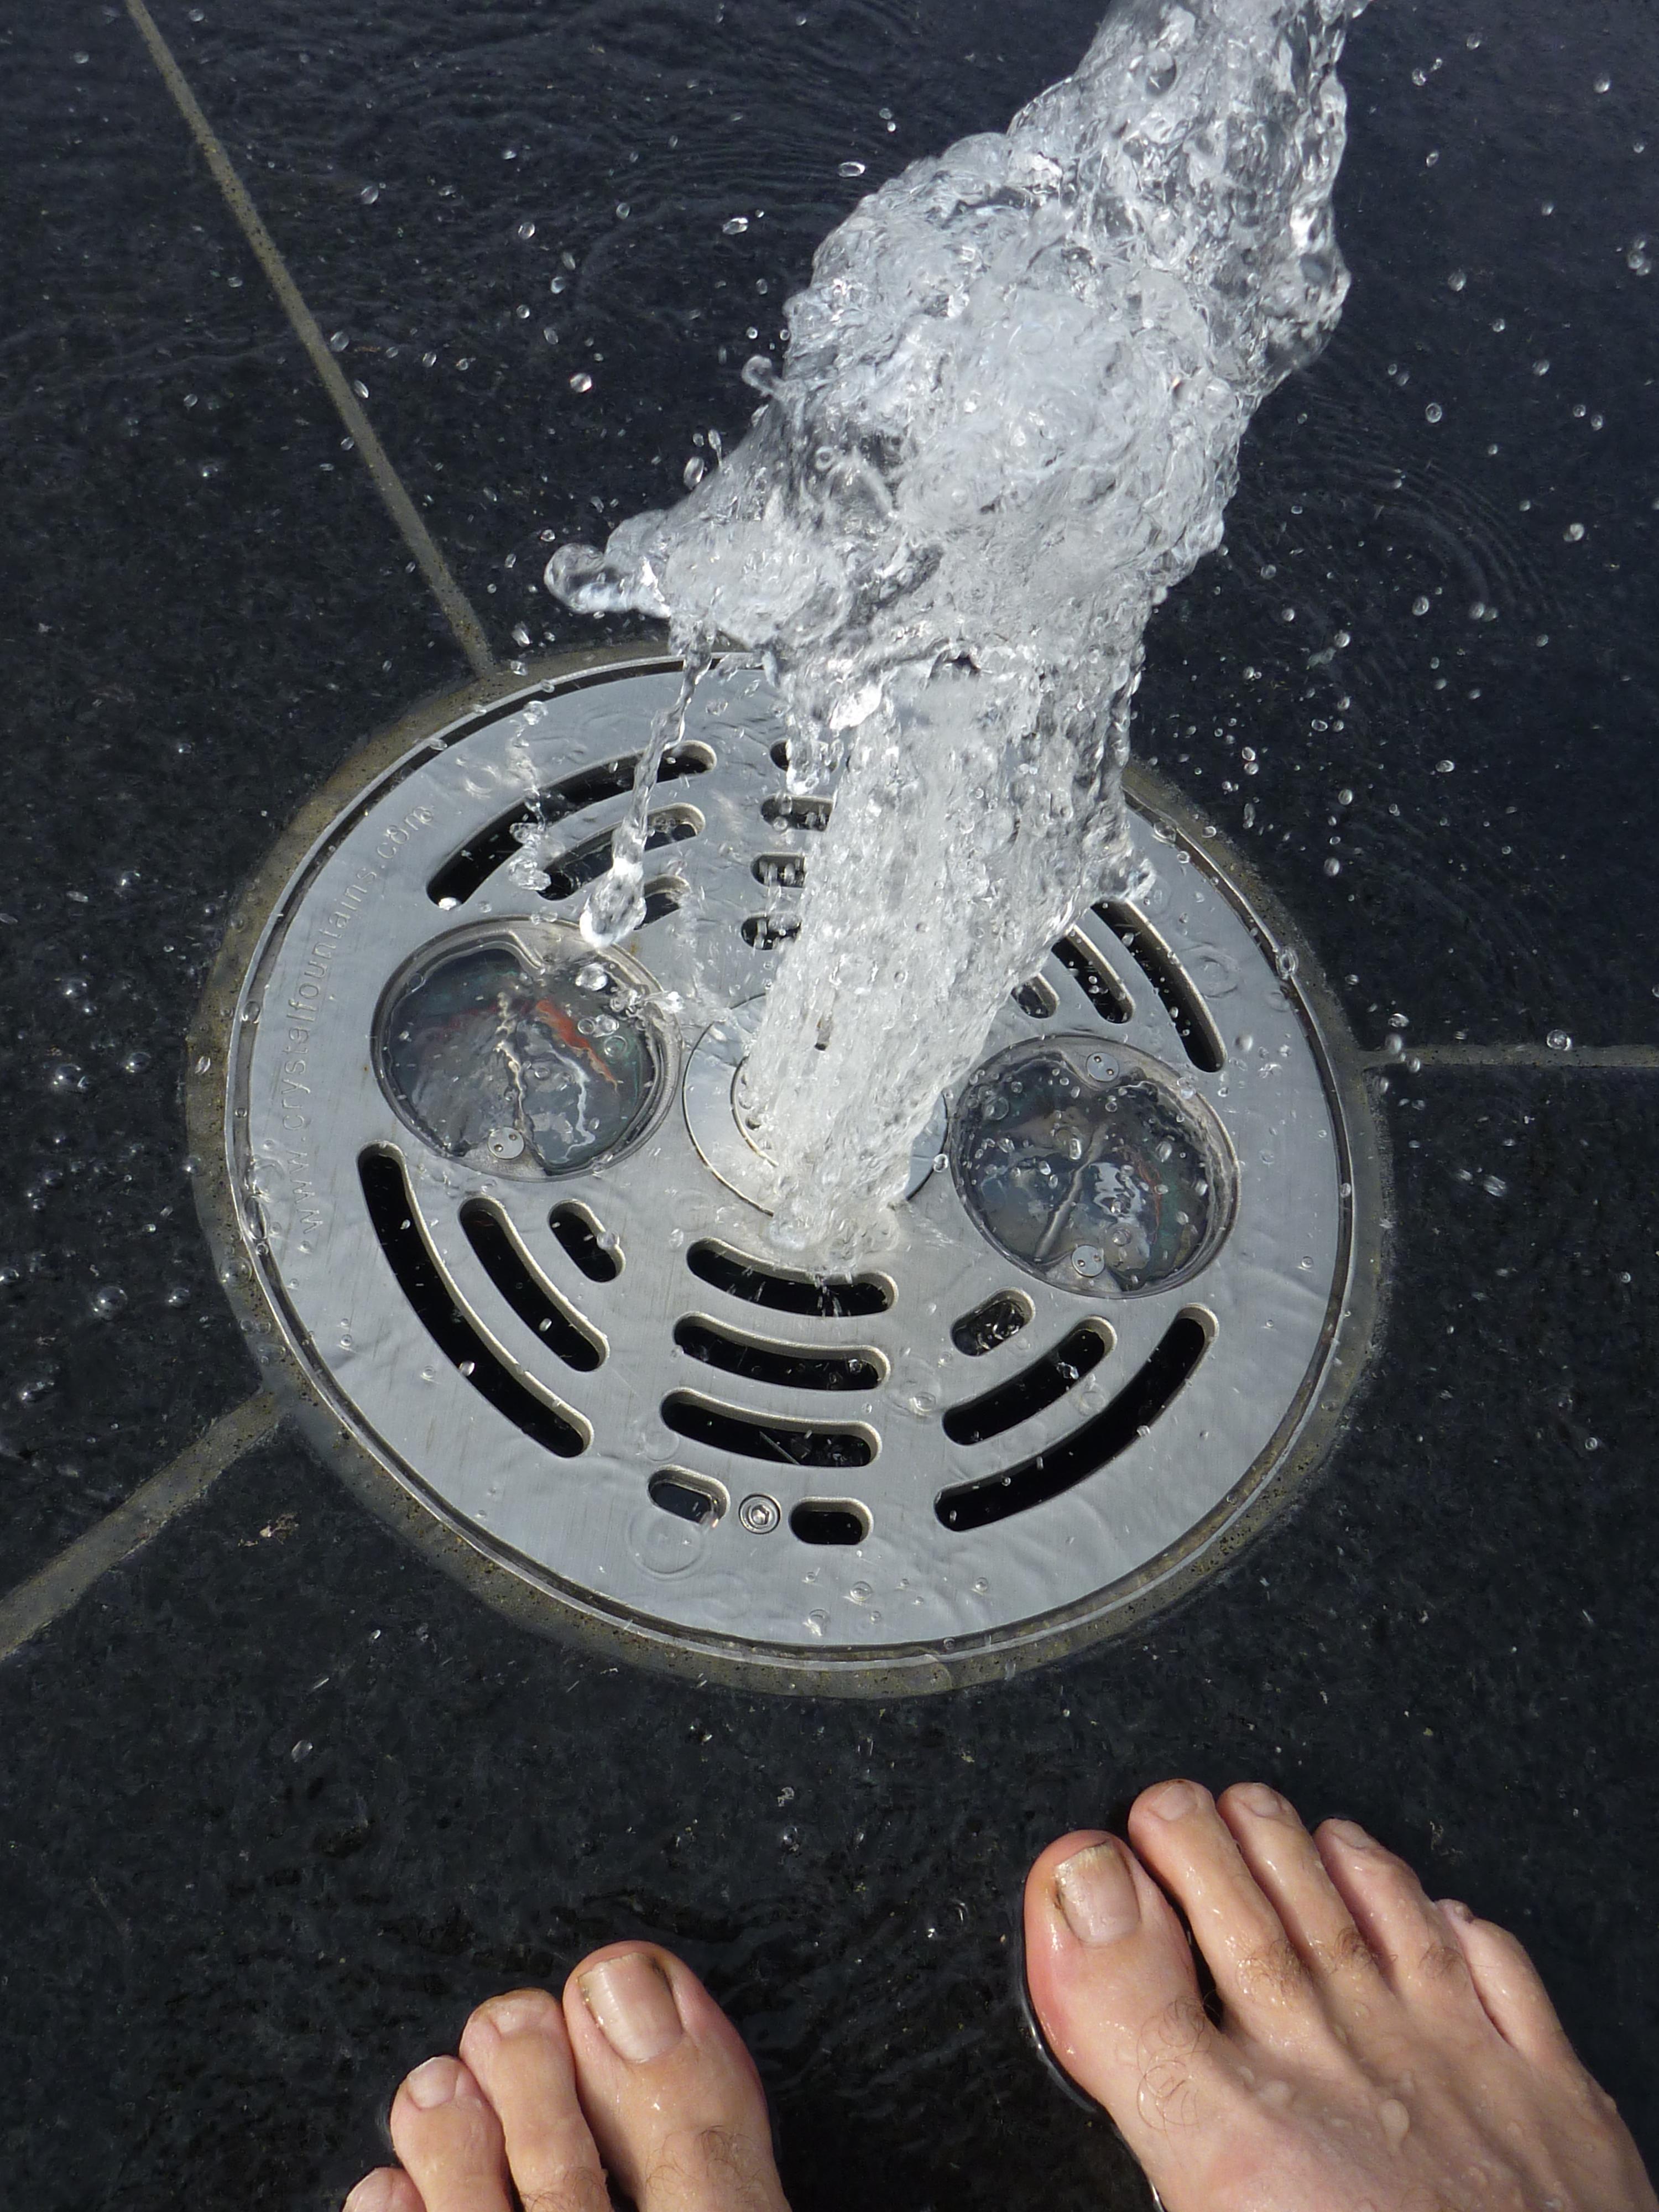 File sugarbeach splashpad water jet p g